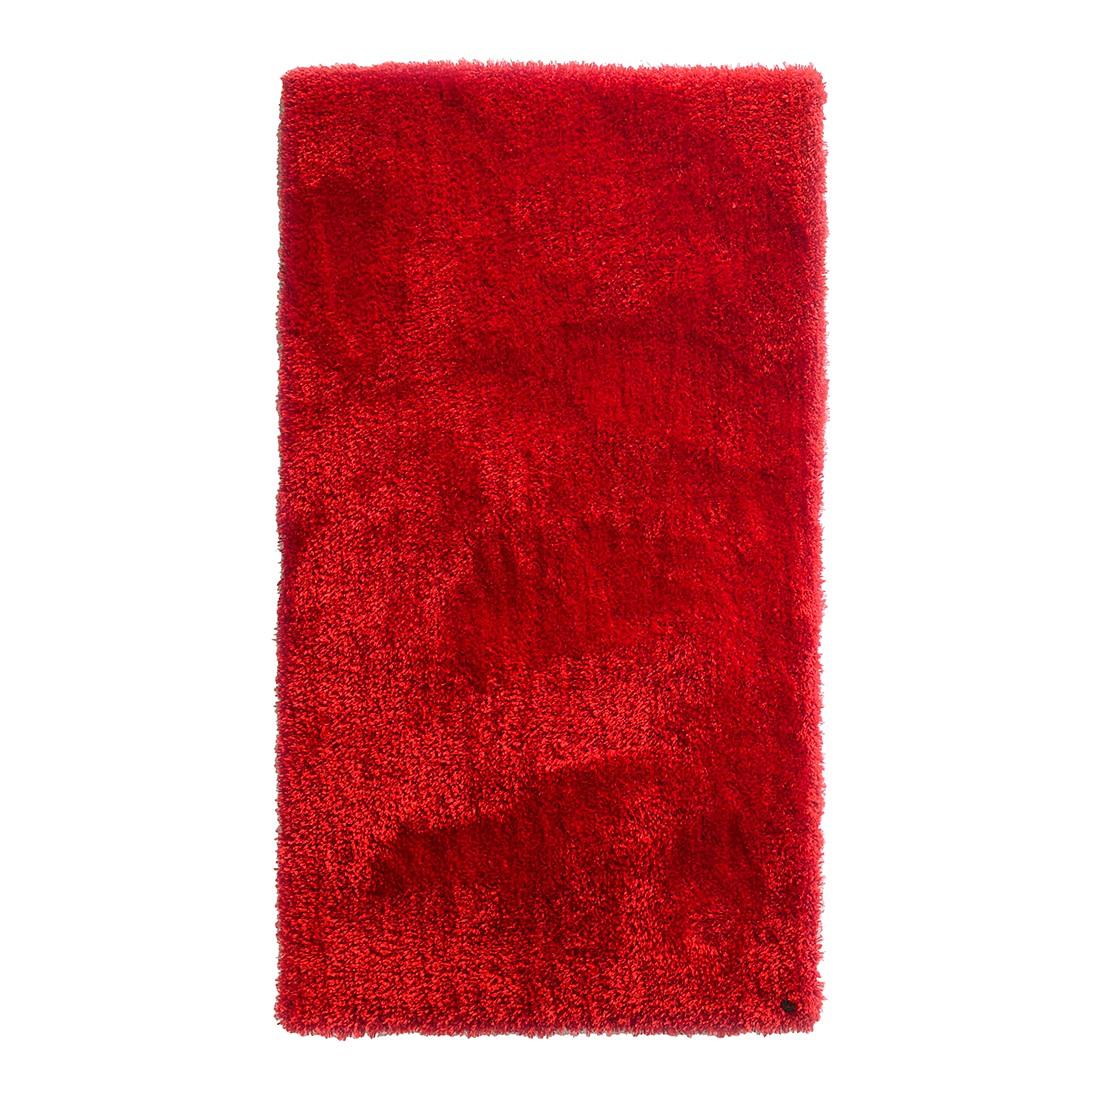 Teppich Soft Square – Rot – Maße: 140 x 200 cm, Tom Tailor jetzt bestellen